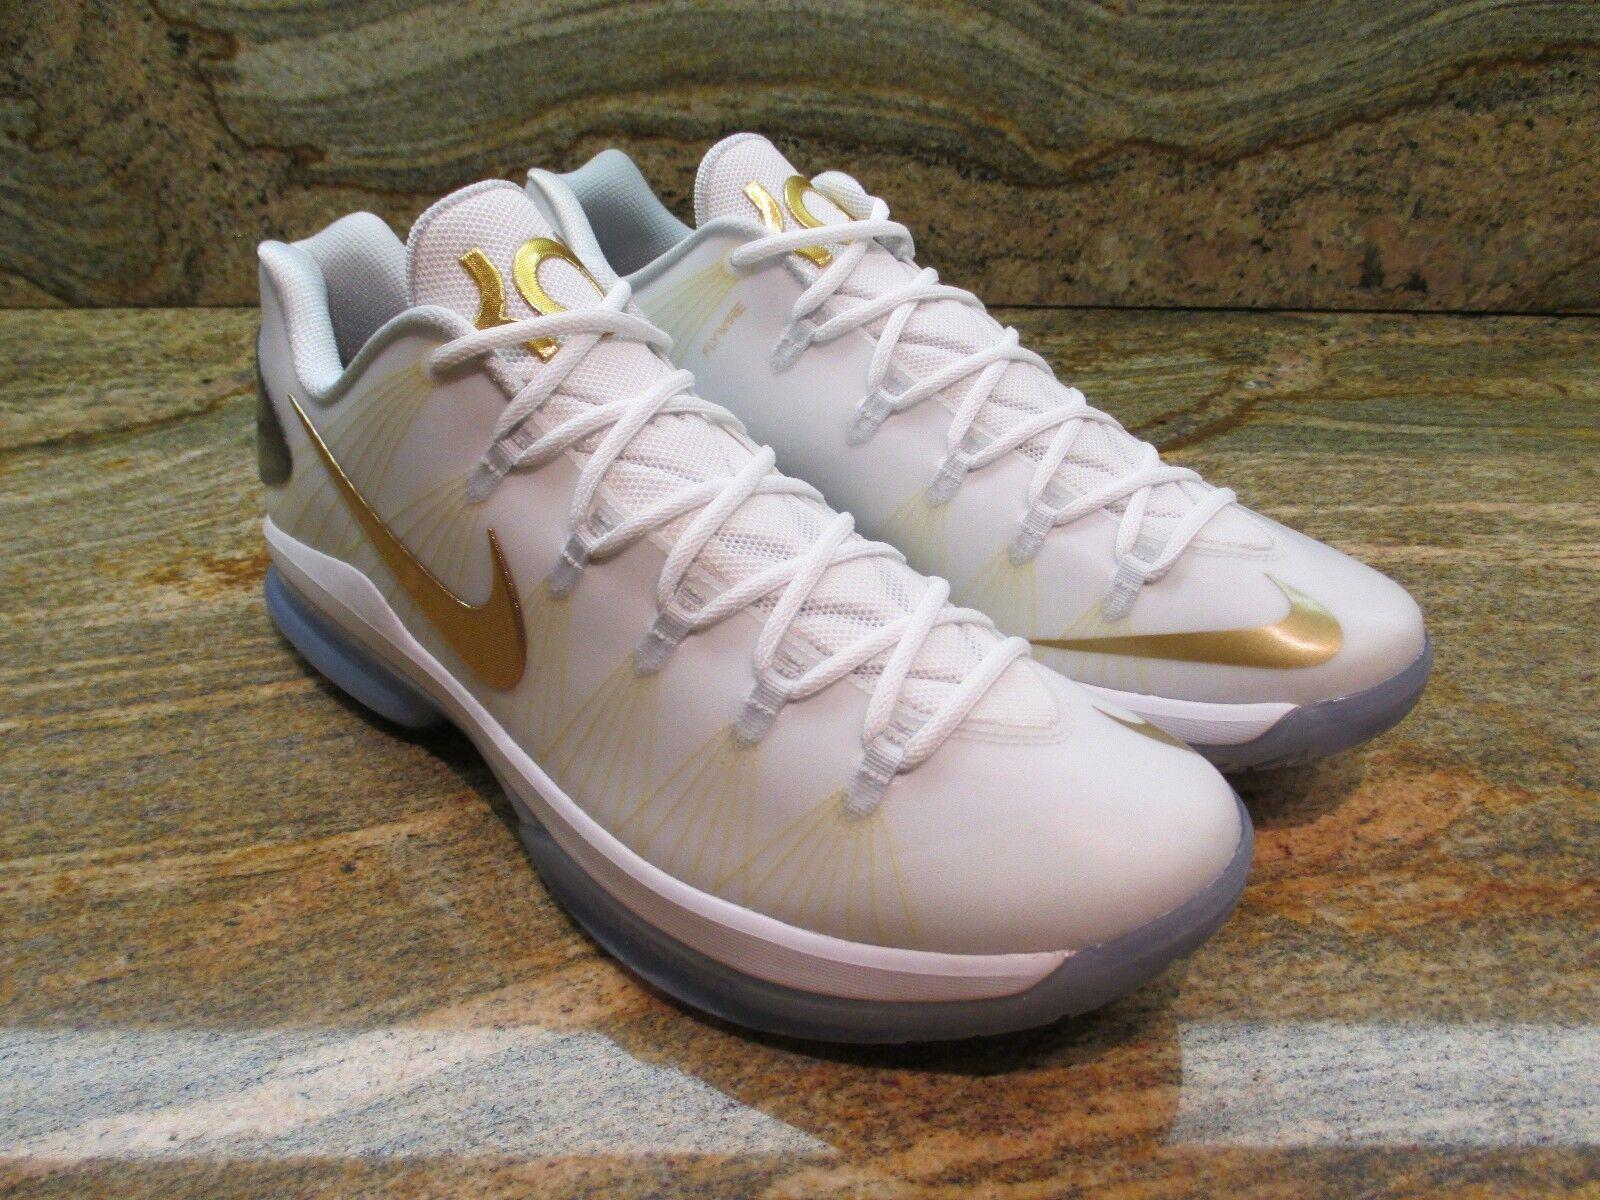 Nike Kd 5 V Elite Promo Probe Sz 13 White Metallic Gold Kevin Durant 585385-100